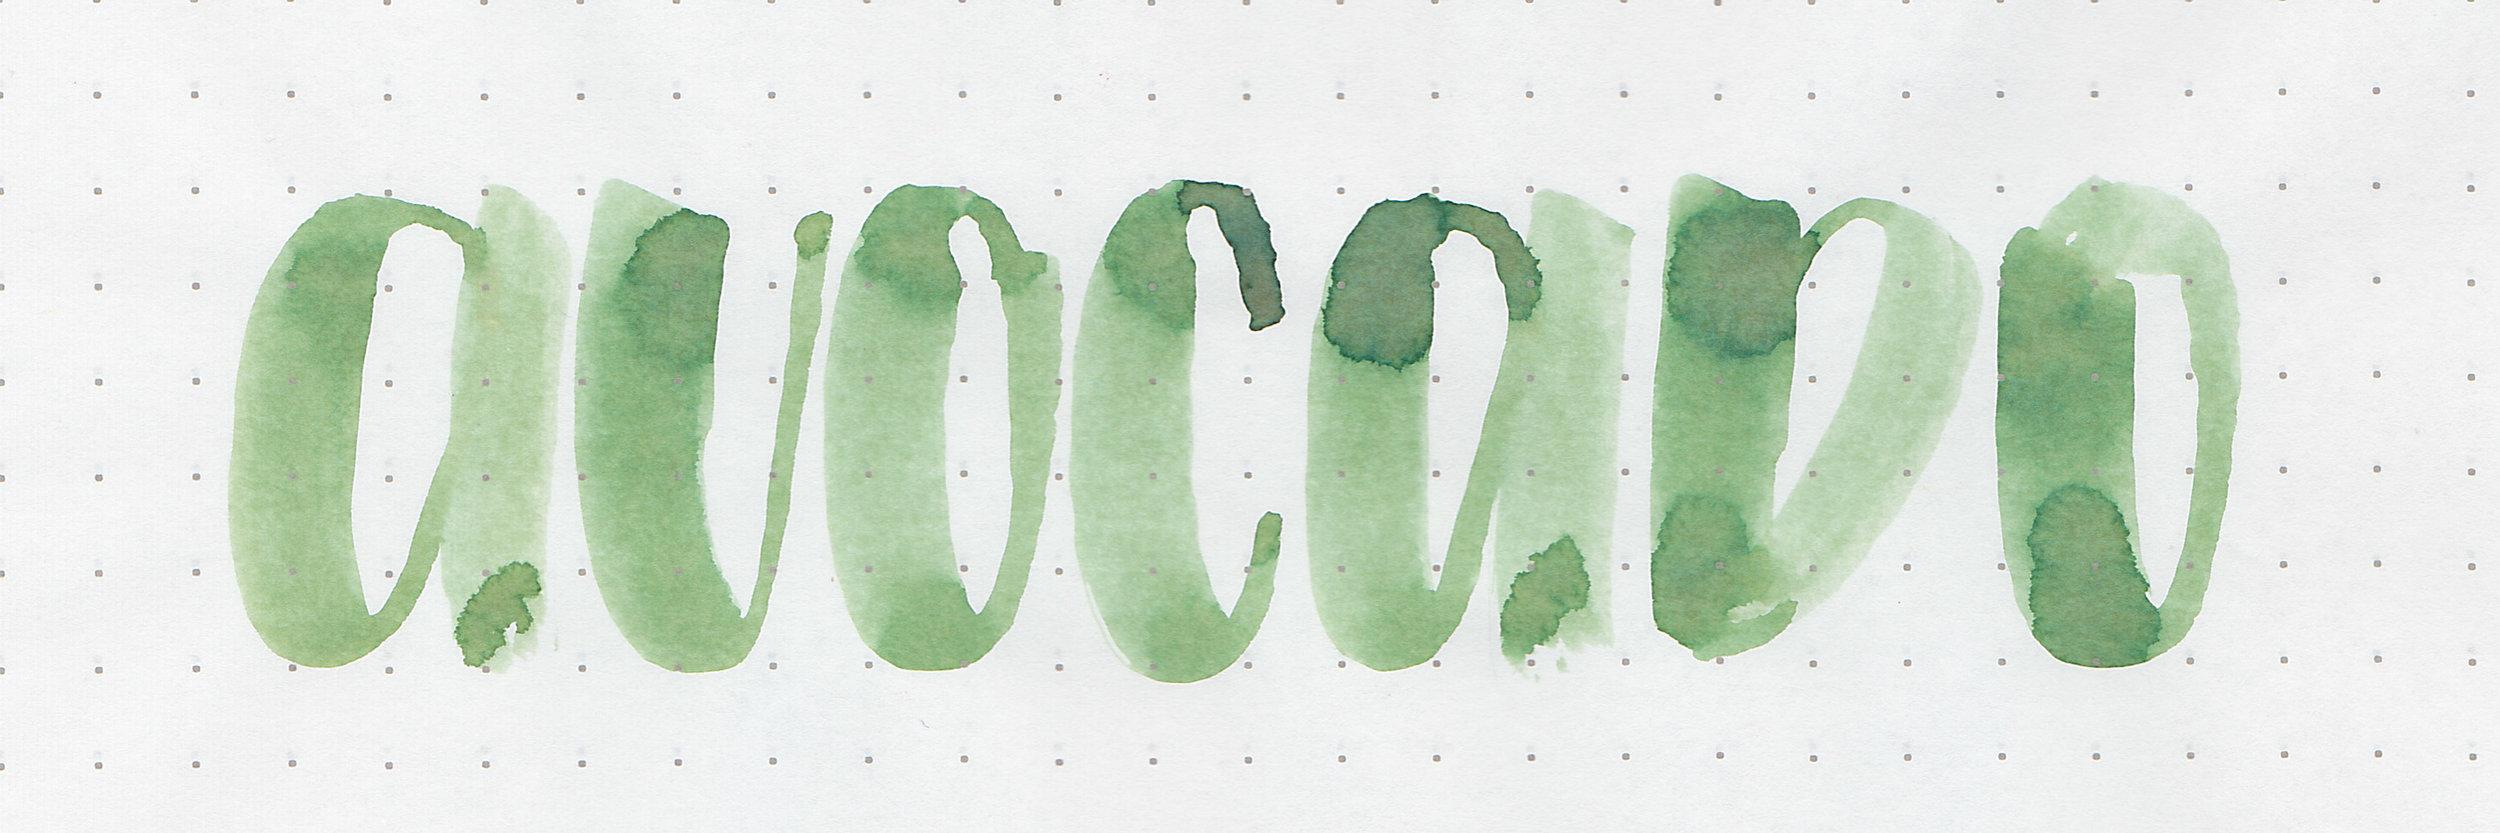 ro-avocado-2.jpg